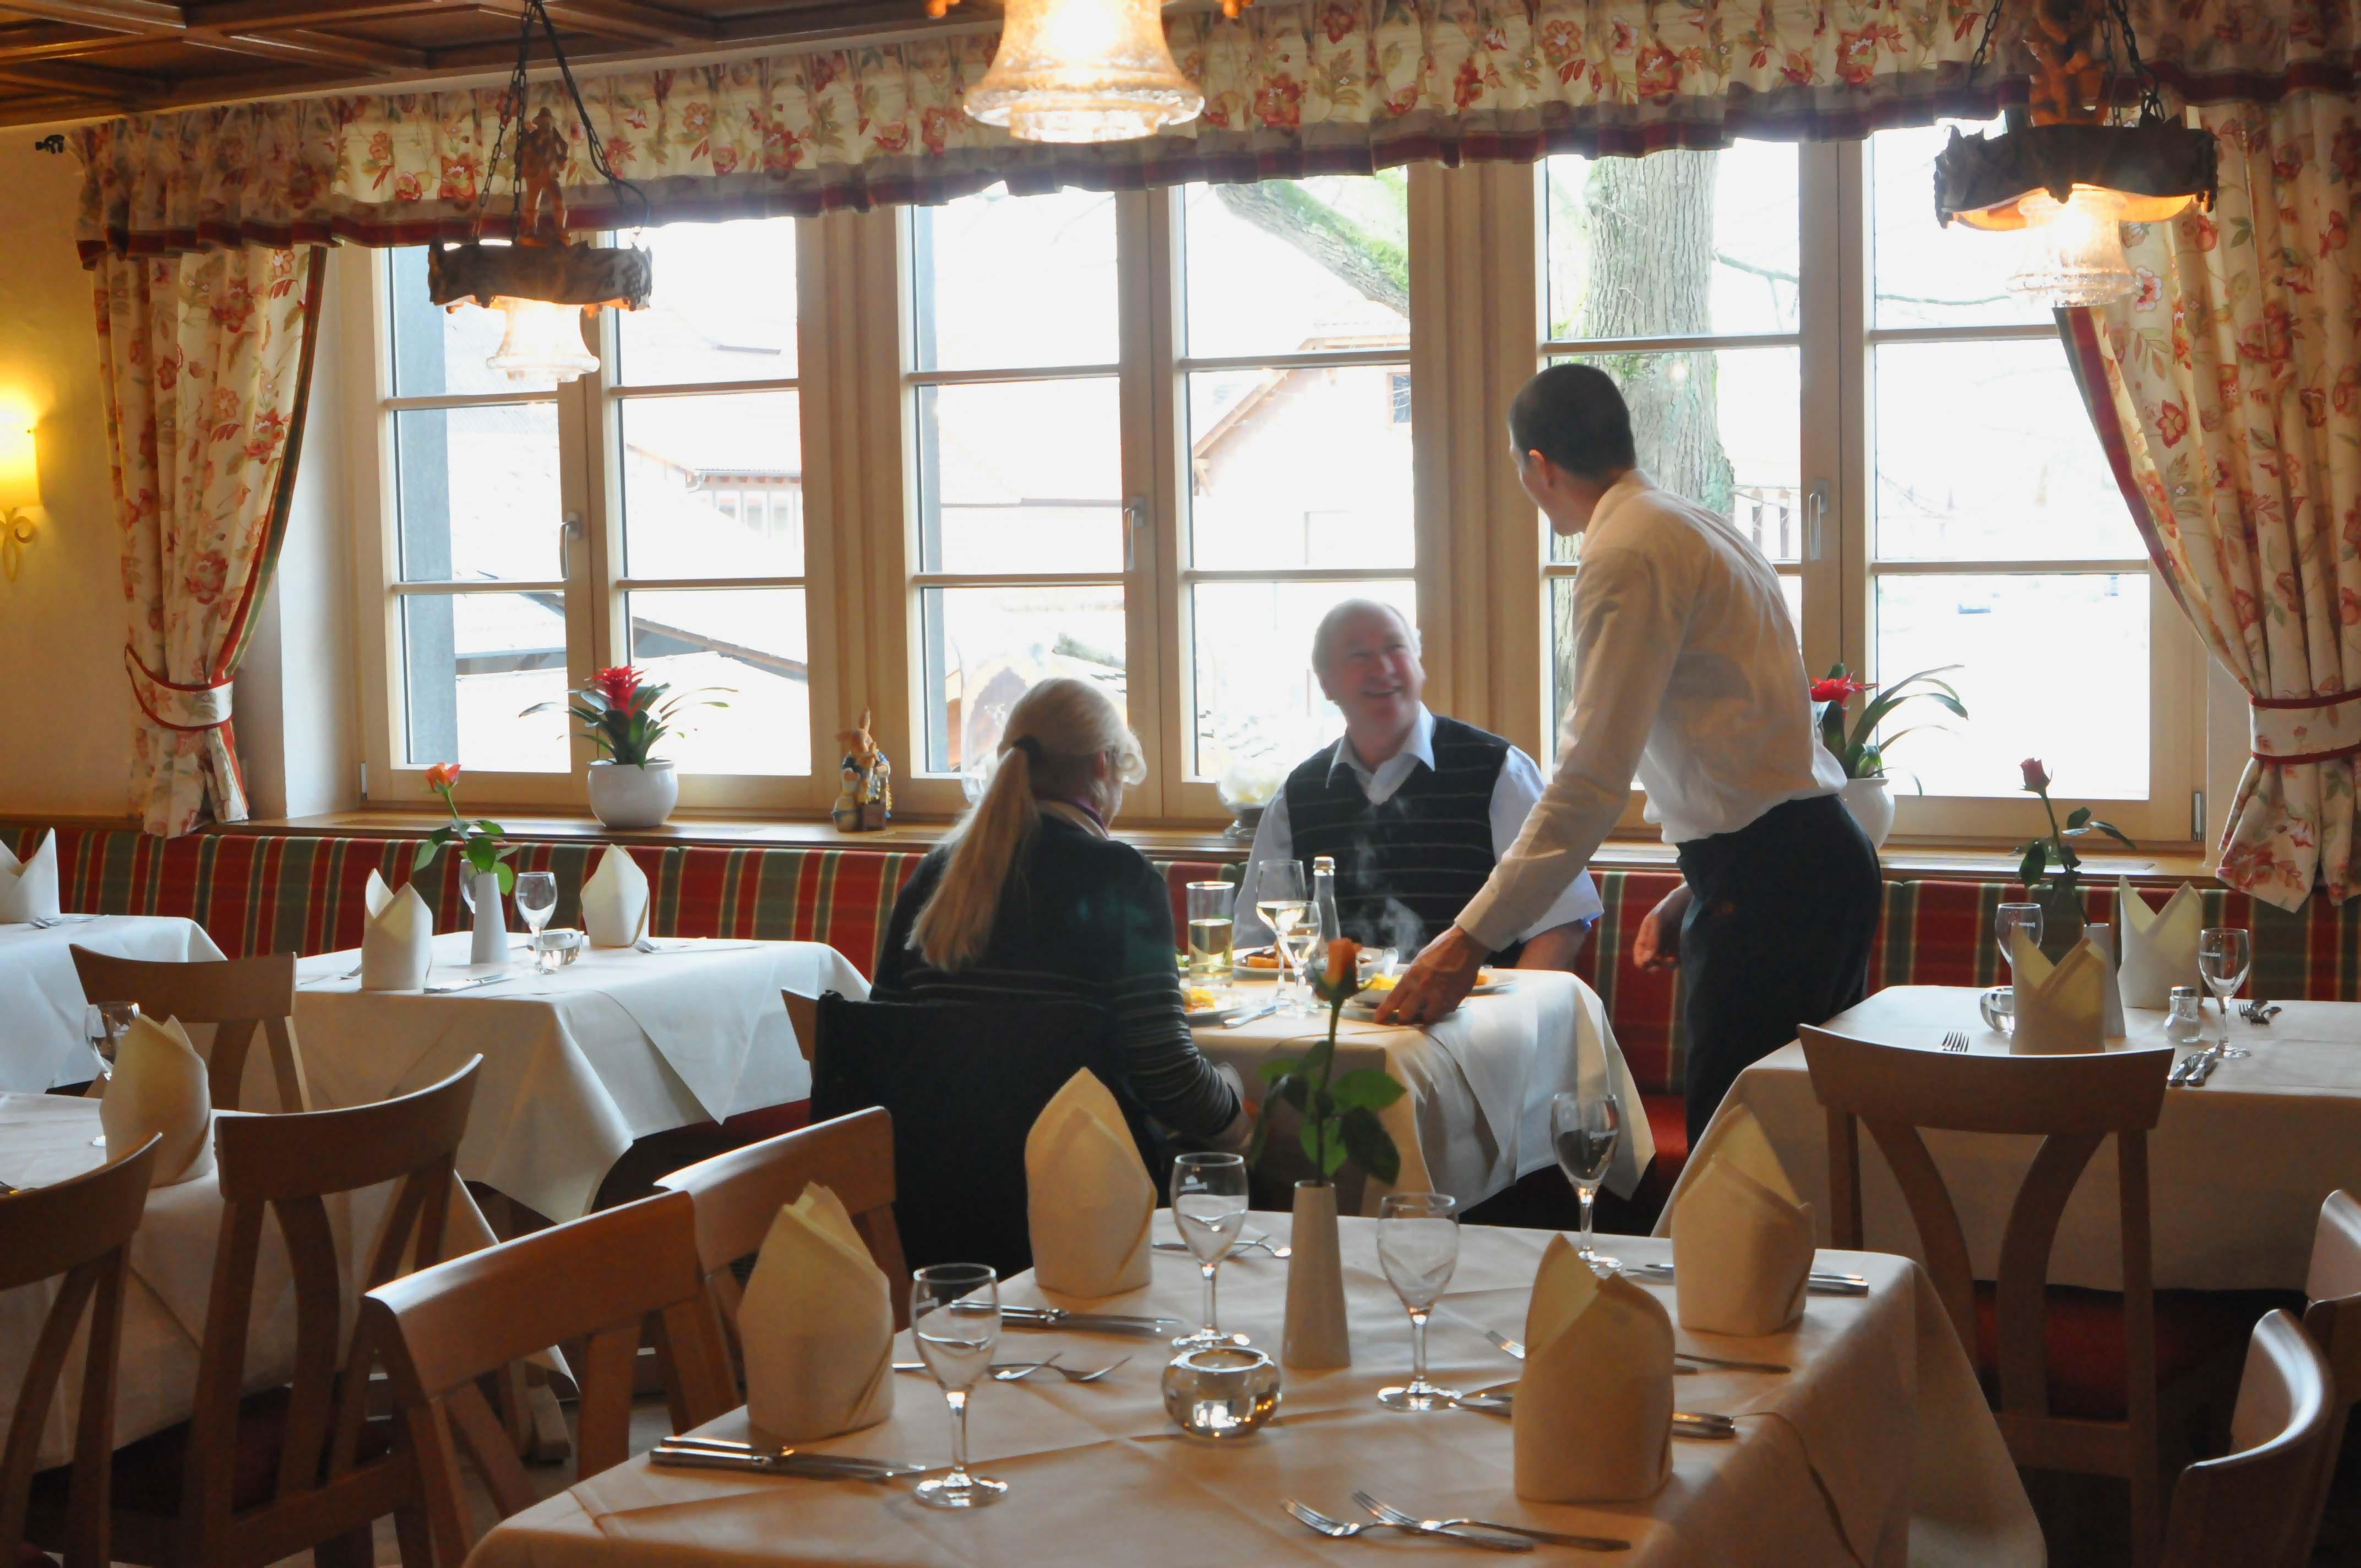 Restaurant Gäste_0129